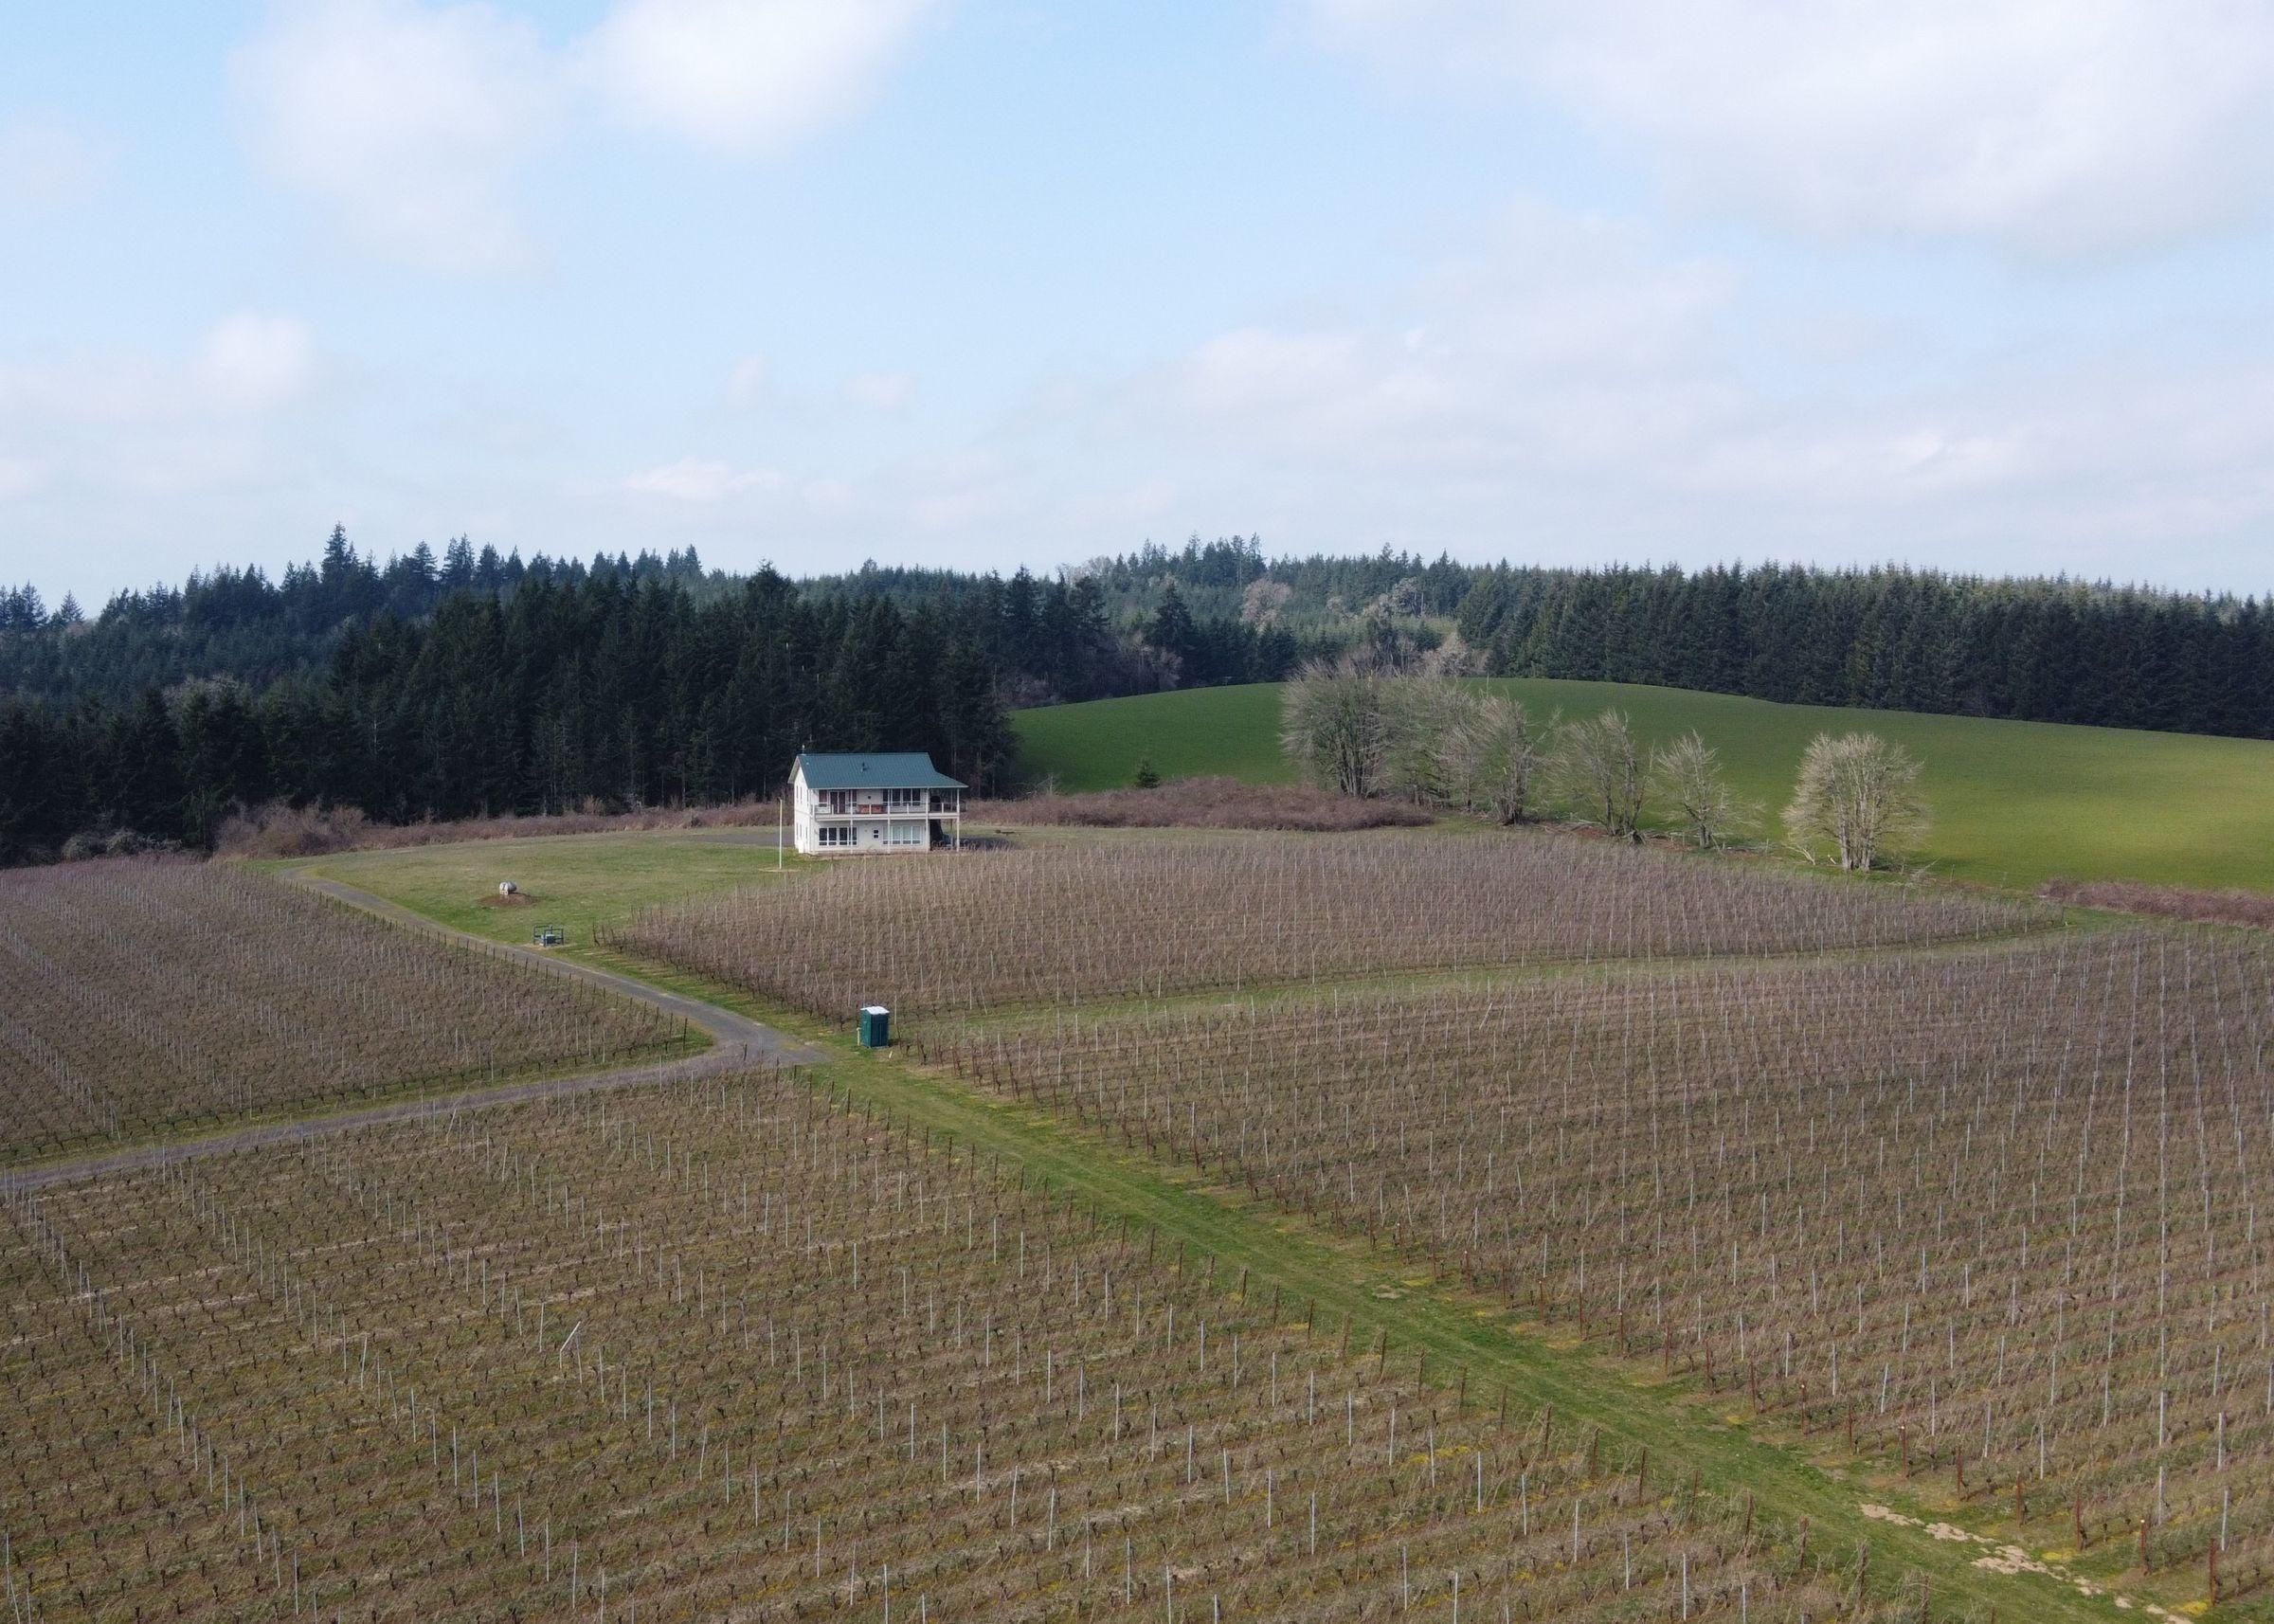 residential-land-polk-county-oregon-65-acres-listing-number-15179-4-2021-03-10-153754.JPG